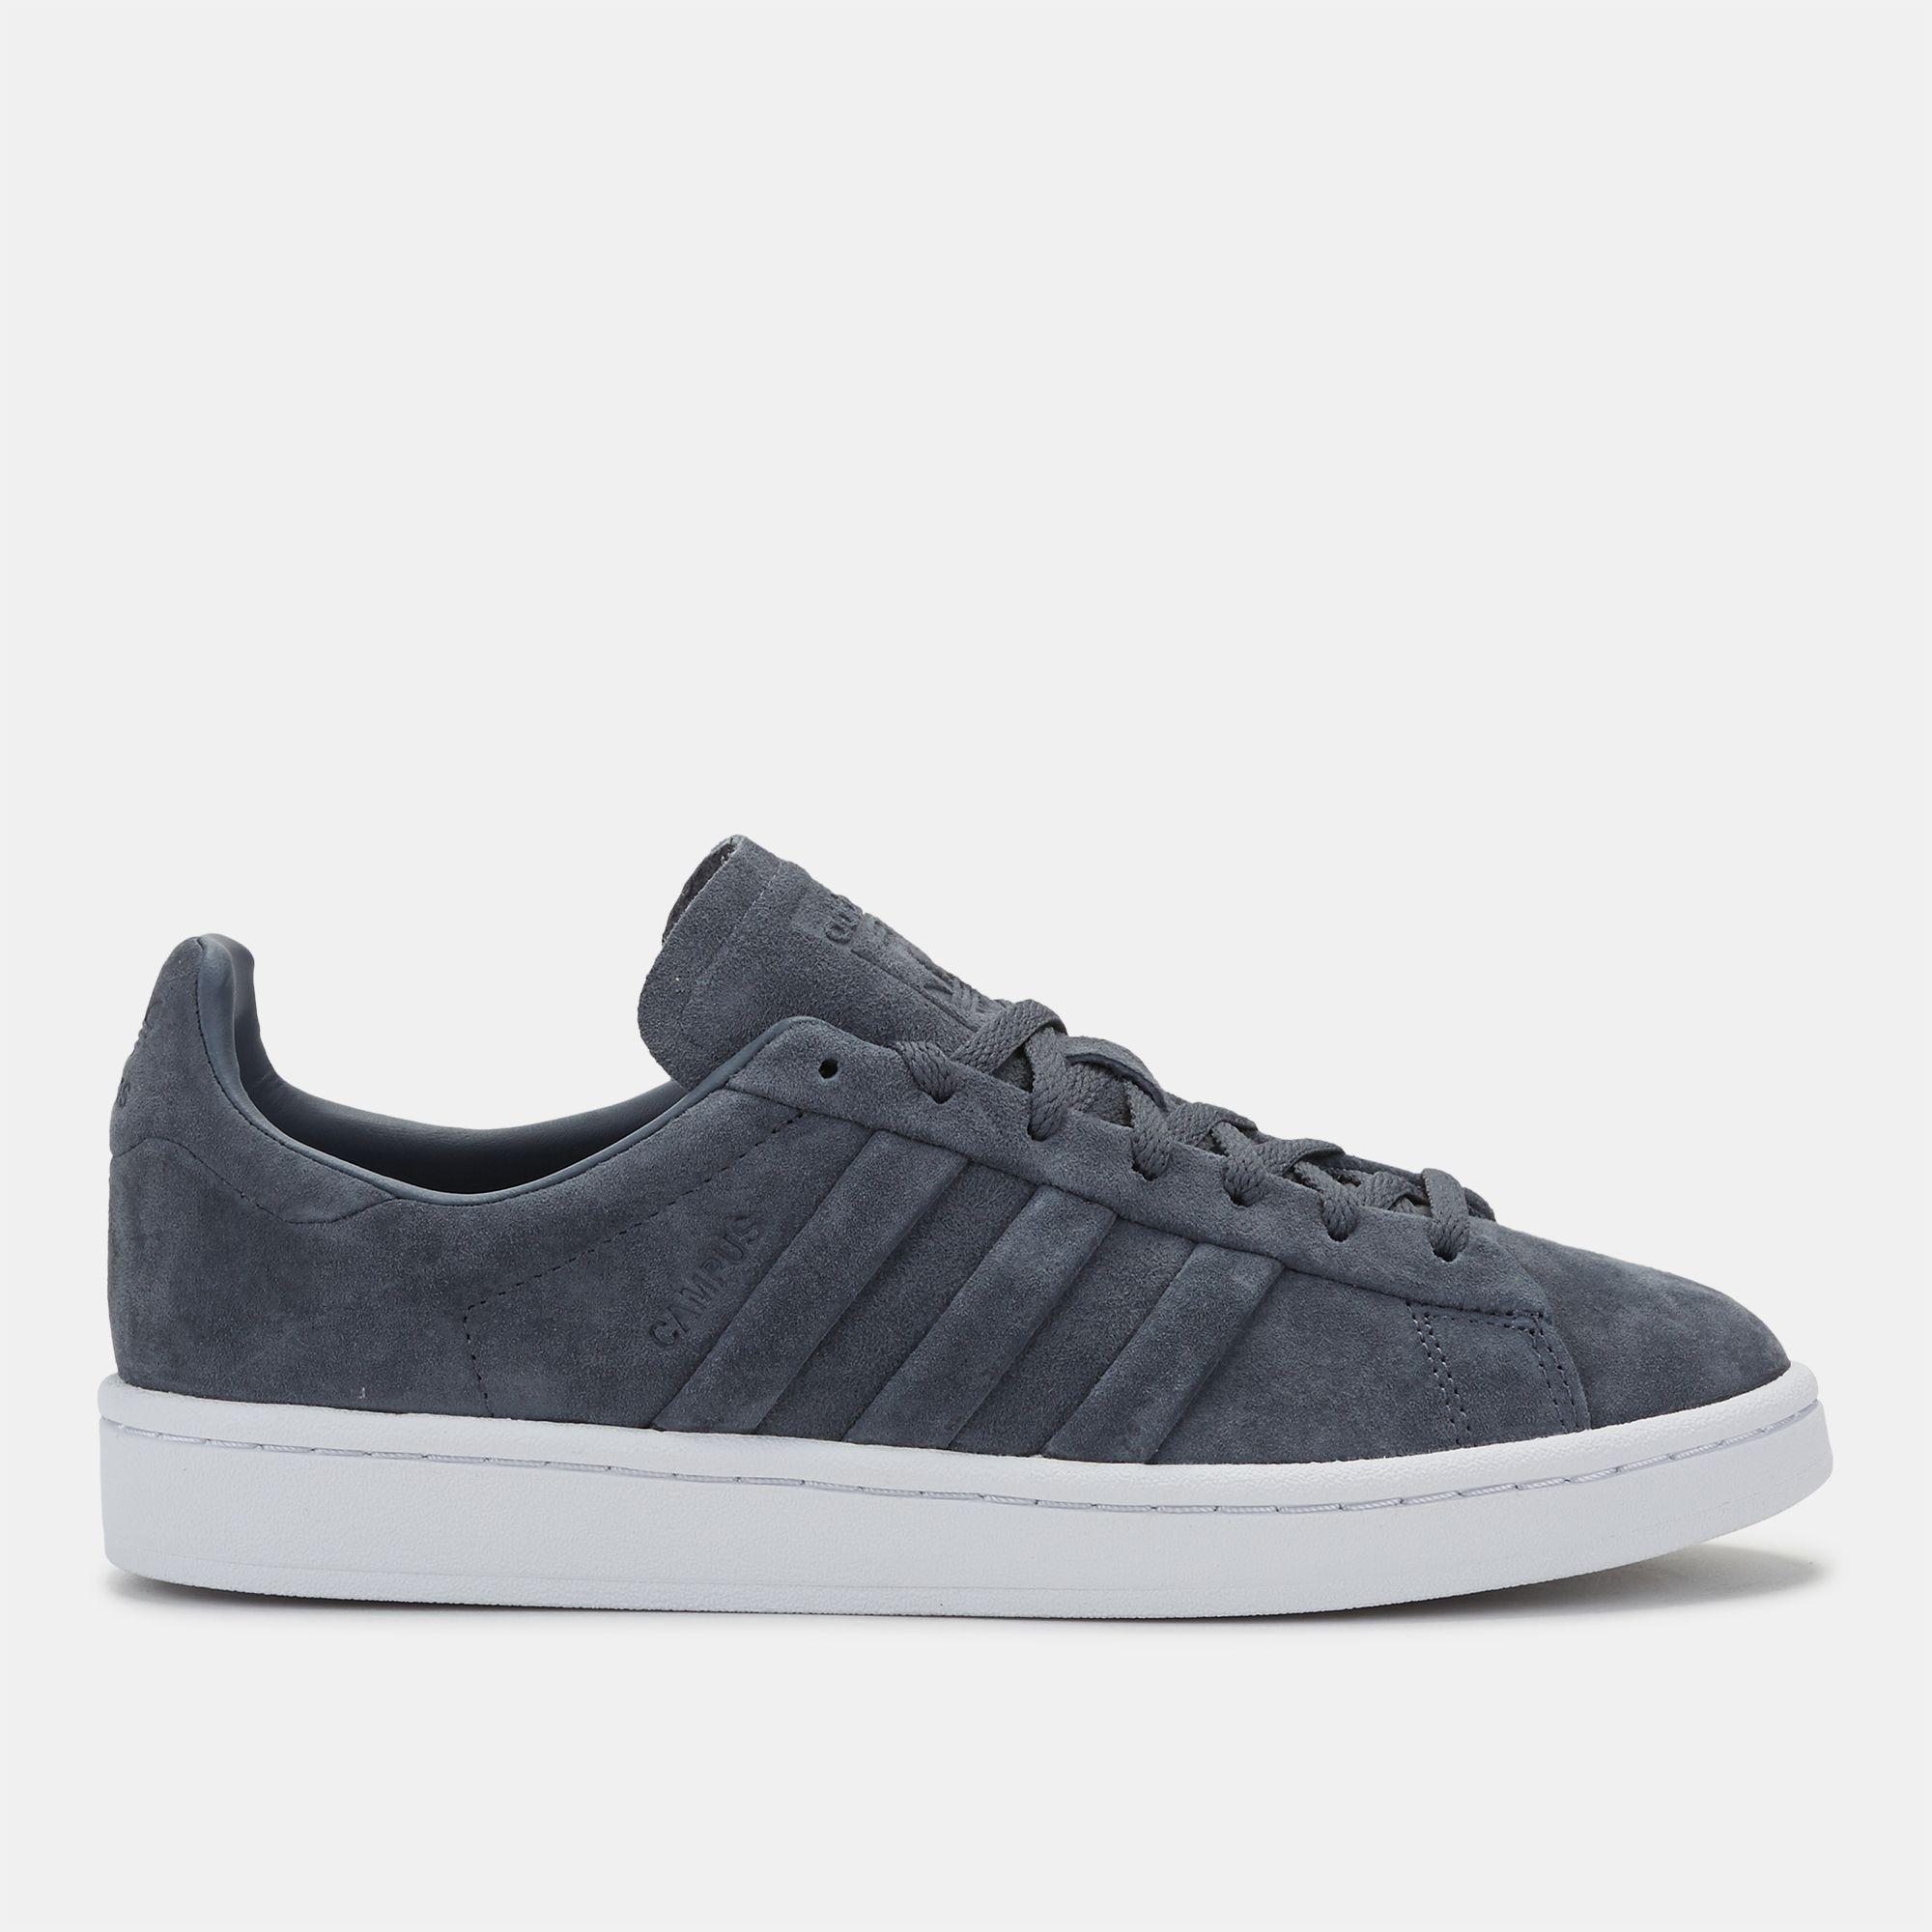 wls79) adidas busenitz patiner les chaussures [noir rojo]